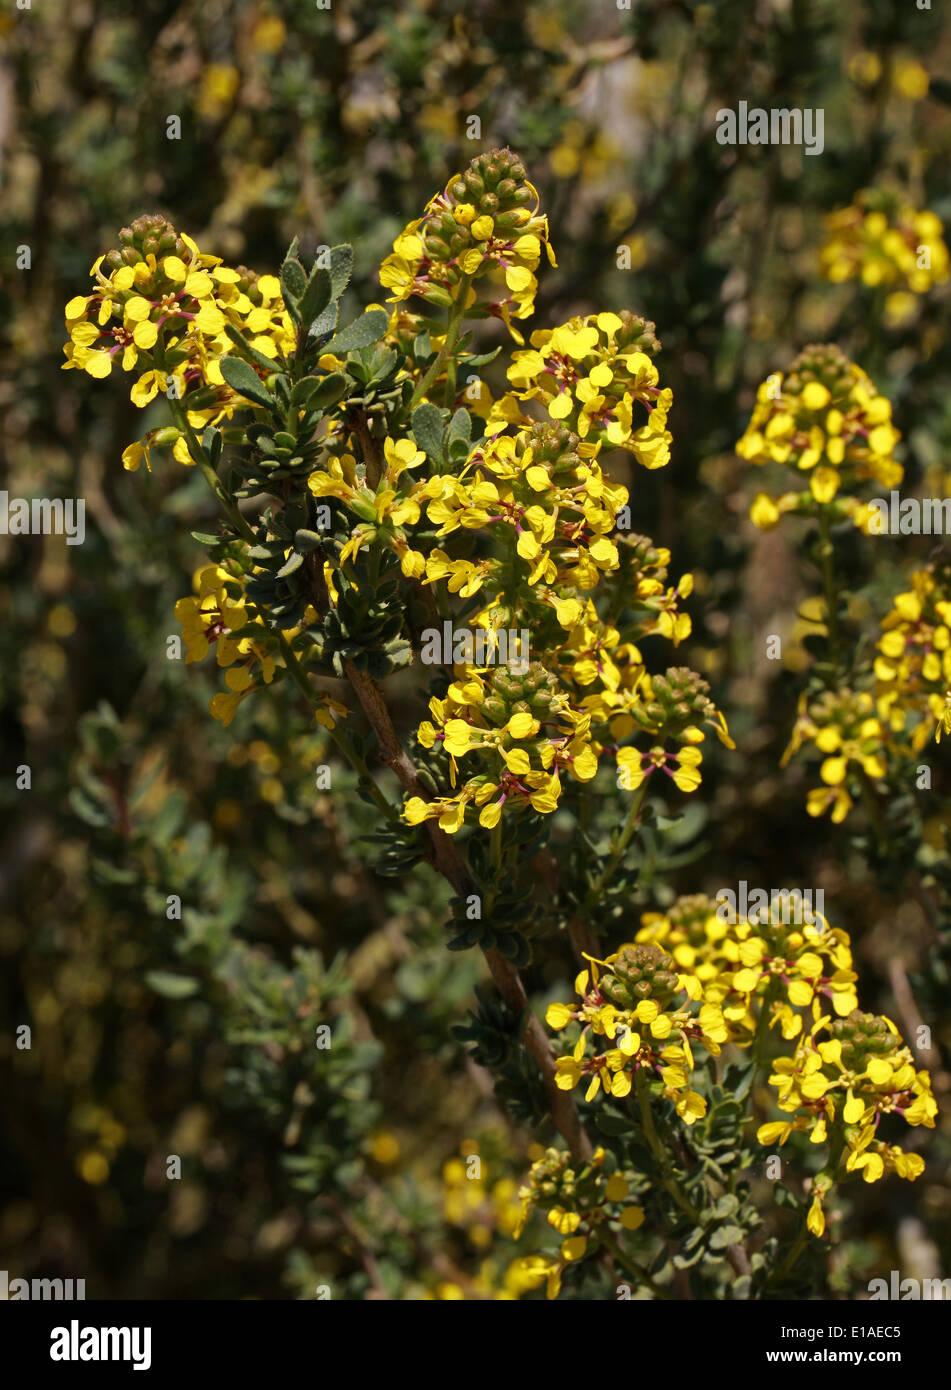 Vella pseudocytisus, Brassicaceae (Cruciferae). Vella is endemic to Algeria, Morocco, and the Iberian Peninsular. - Stock Image